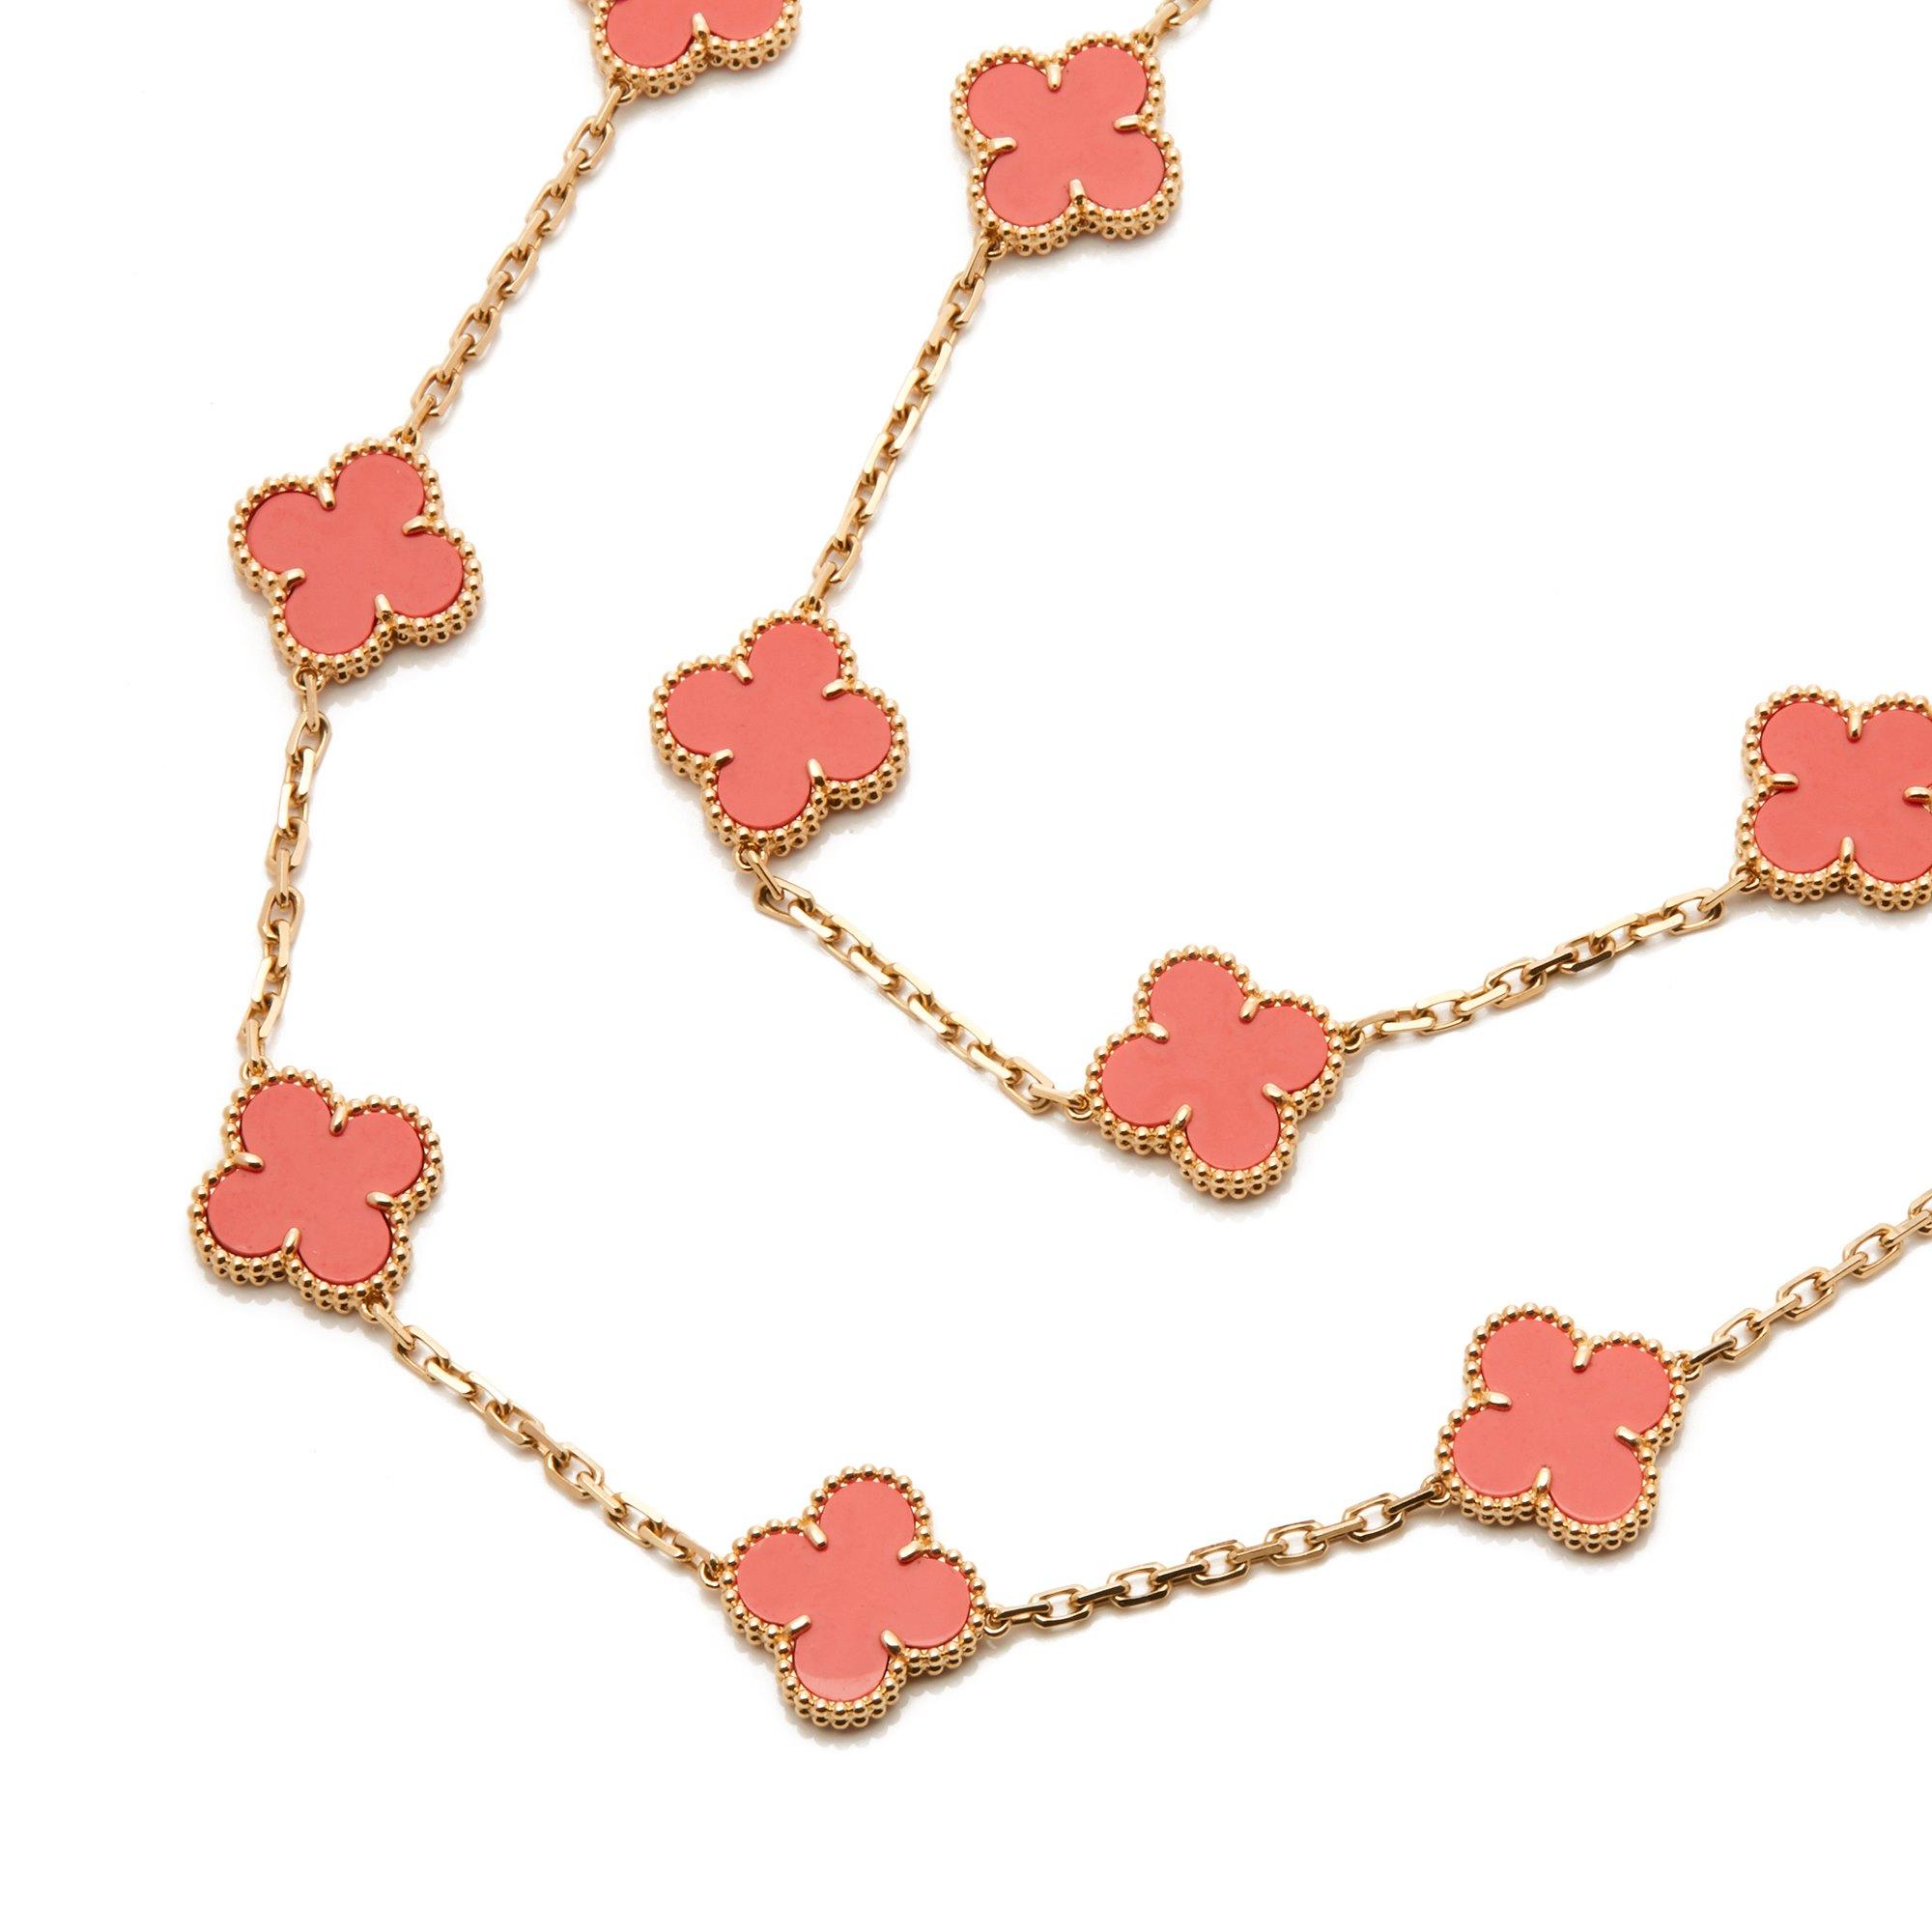 Van Cleef & Arpels 18k Yellow Gold Coral 20 Motif Vintage Alhambra Necklace